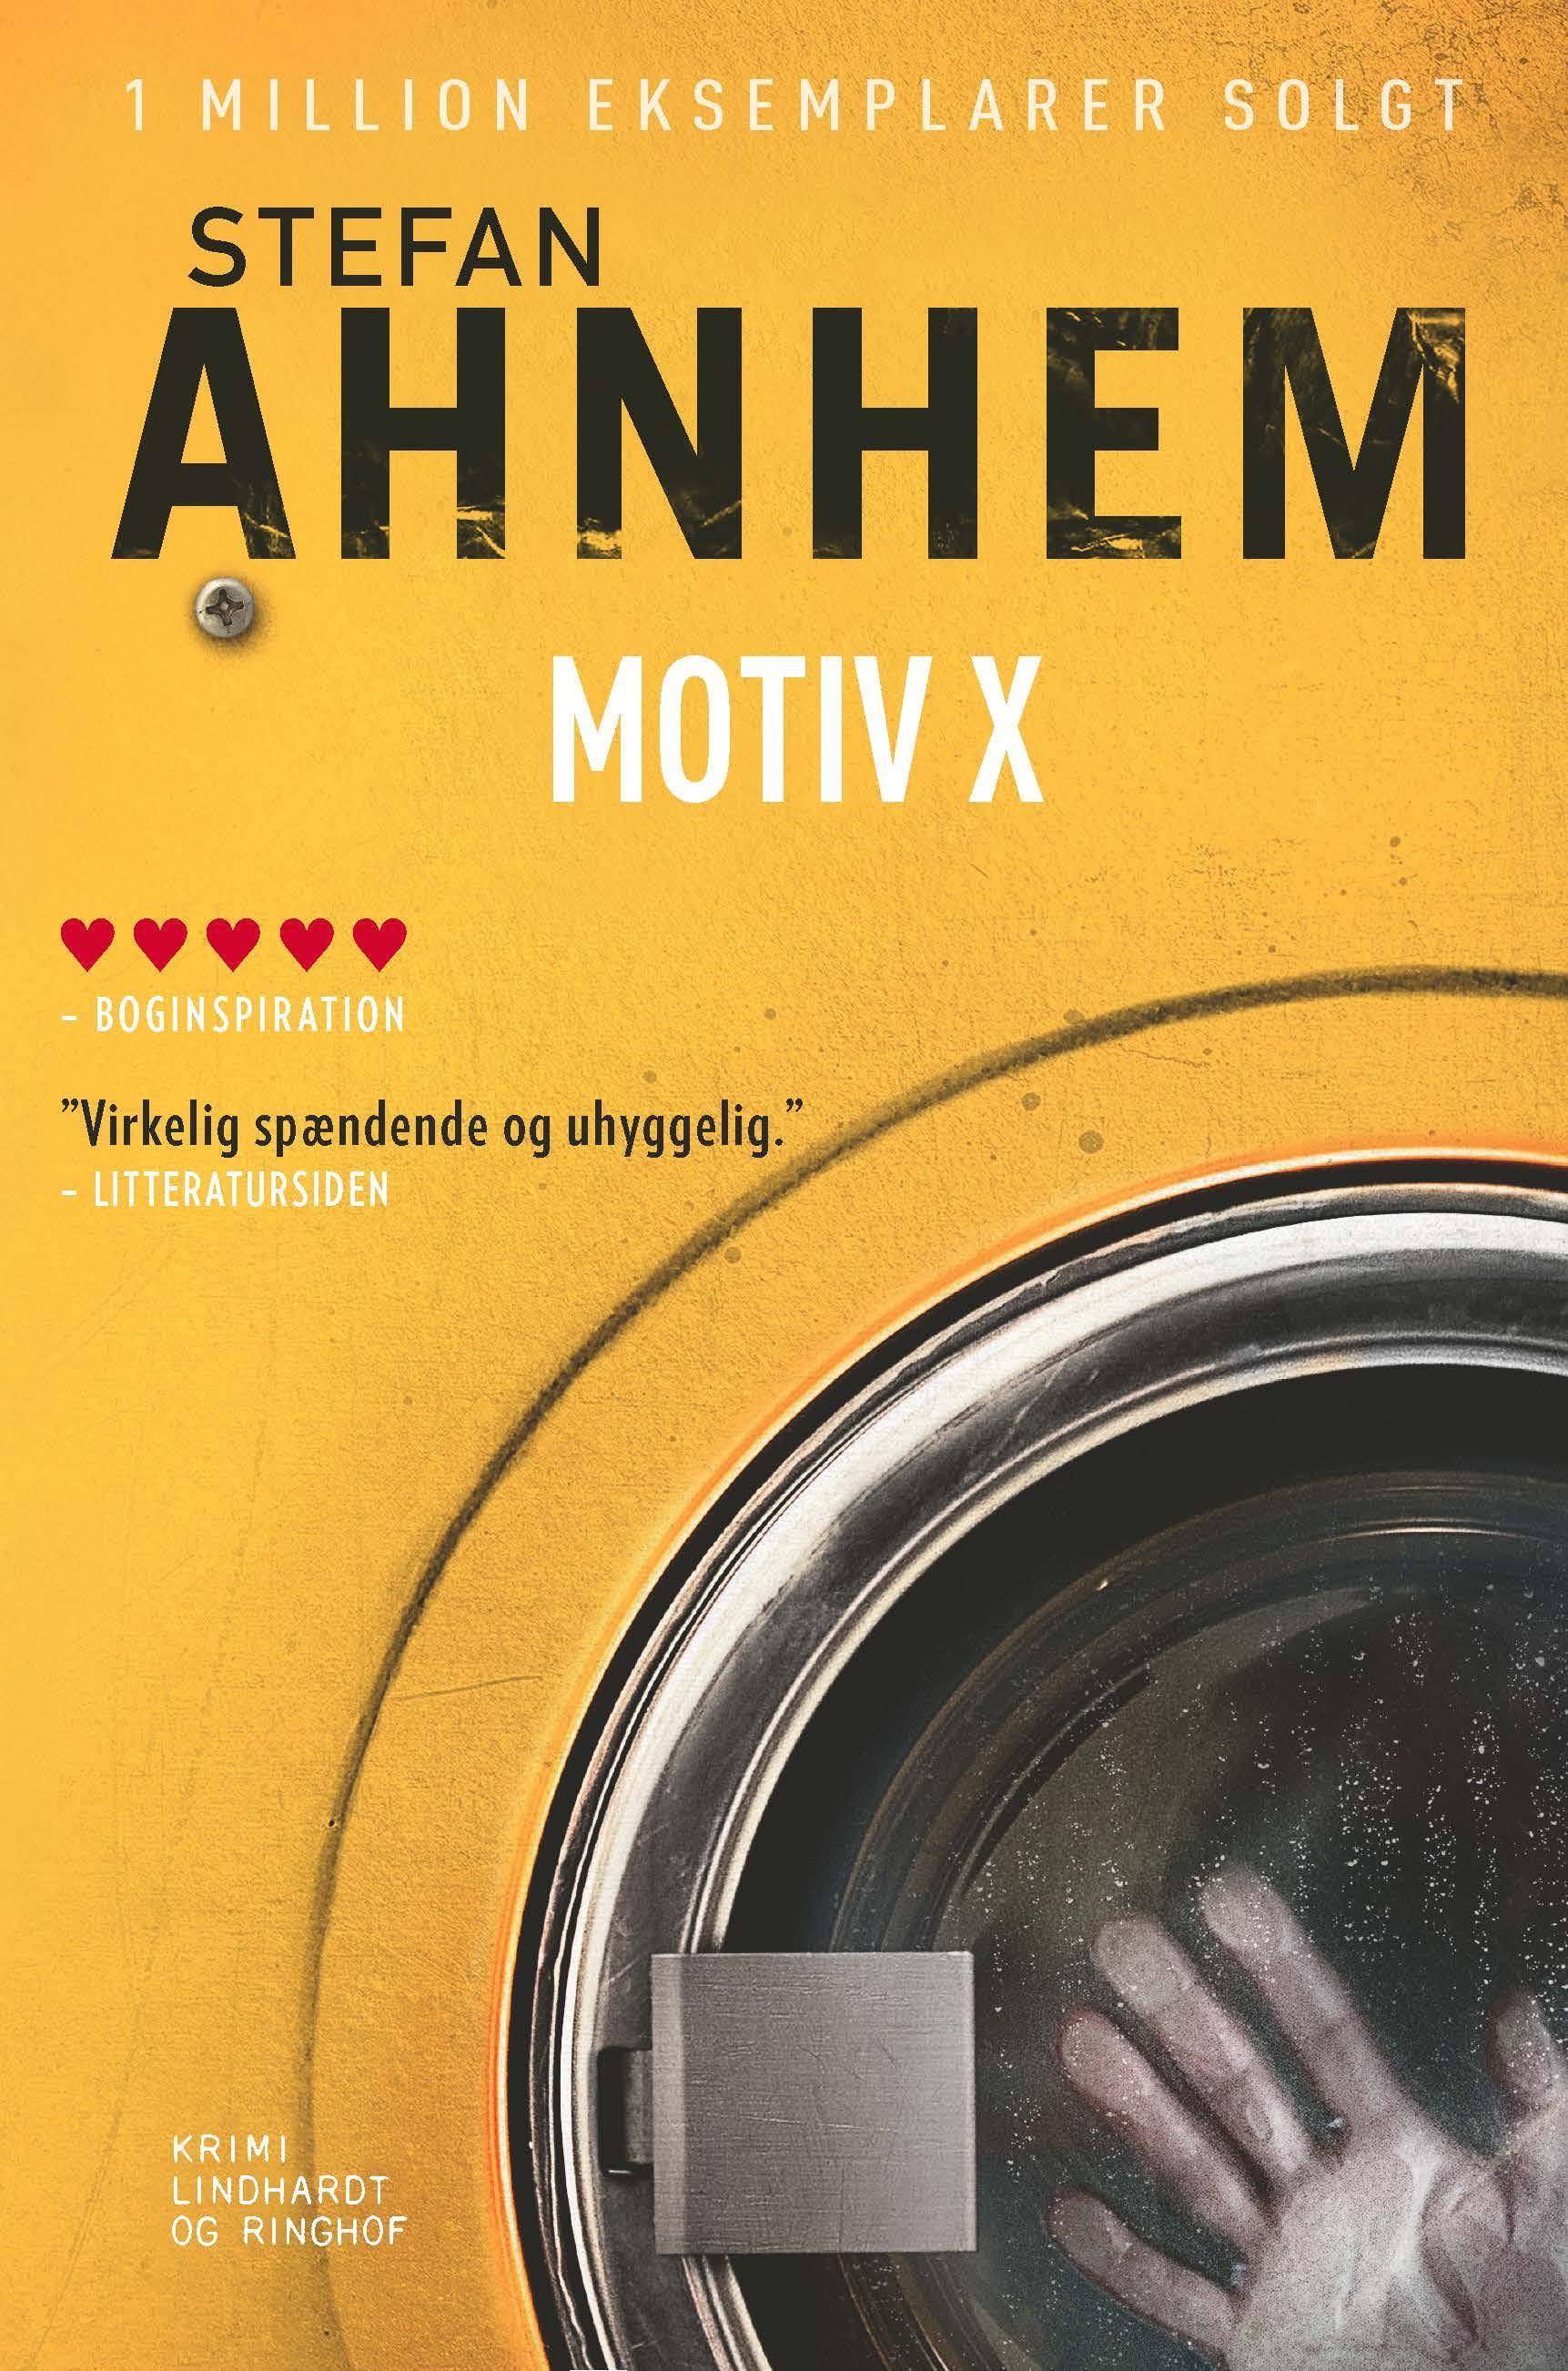 Fabian Risk-serien: Motiv X - Stefan Ahnhem - Bøger - Lindhardt og Ringhof - 9788711917190 - February 3, 2020